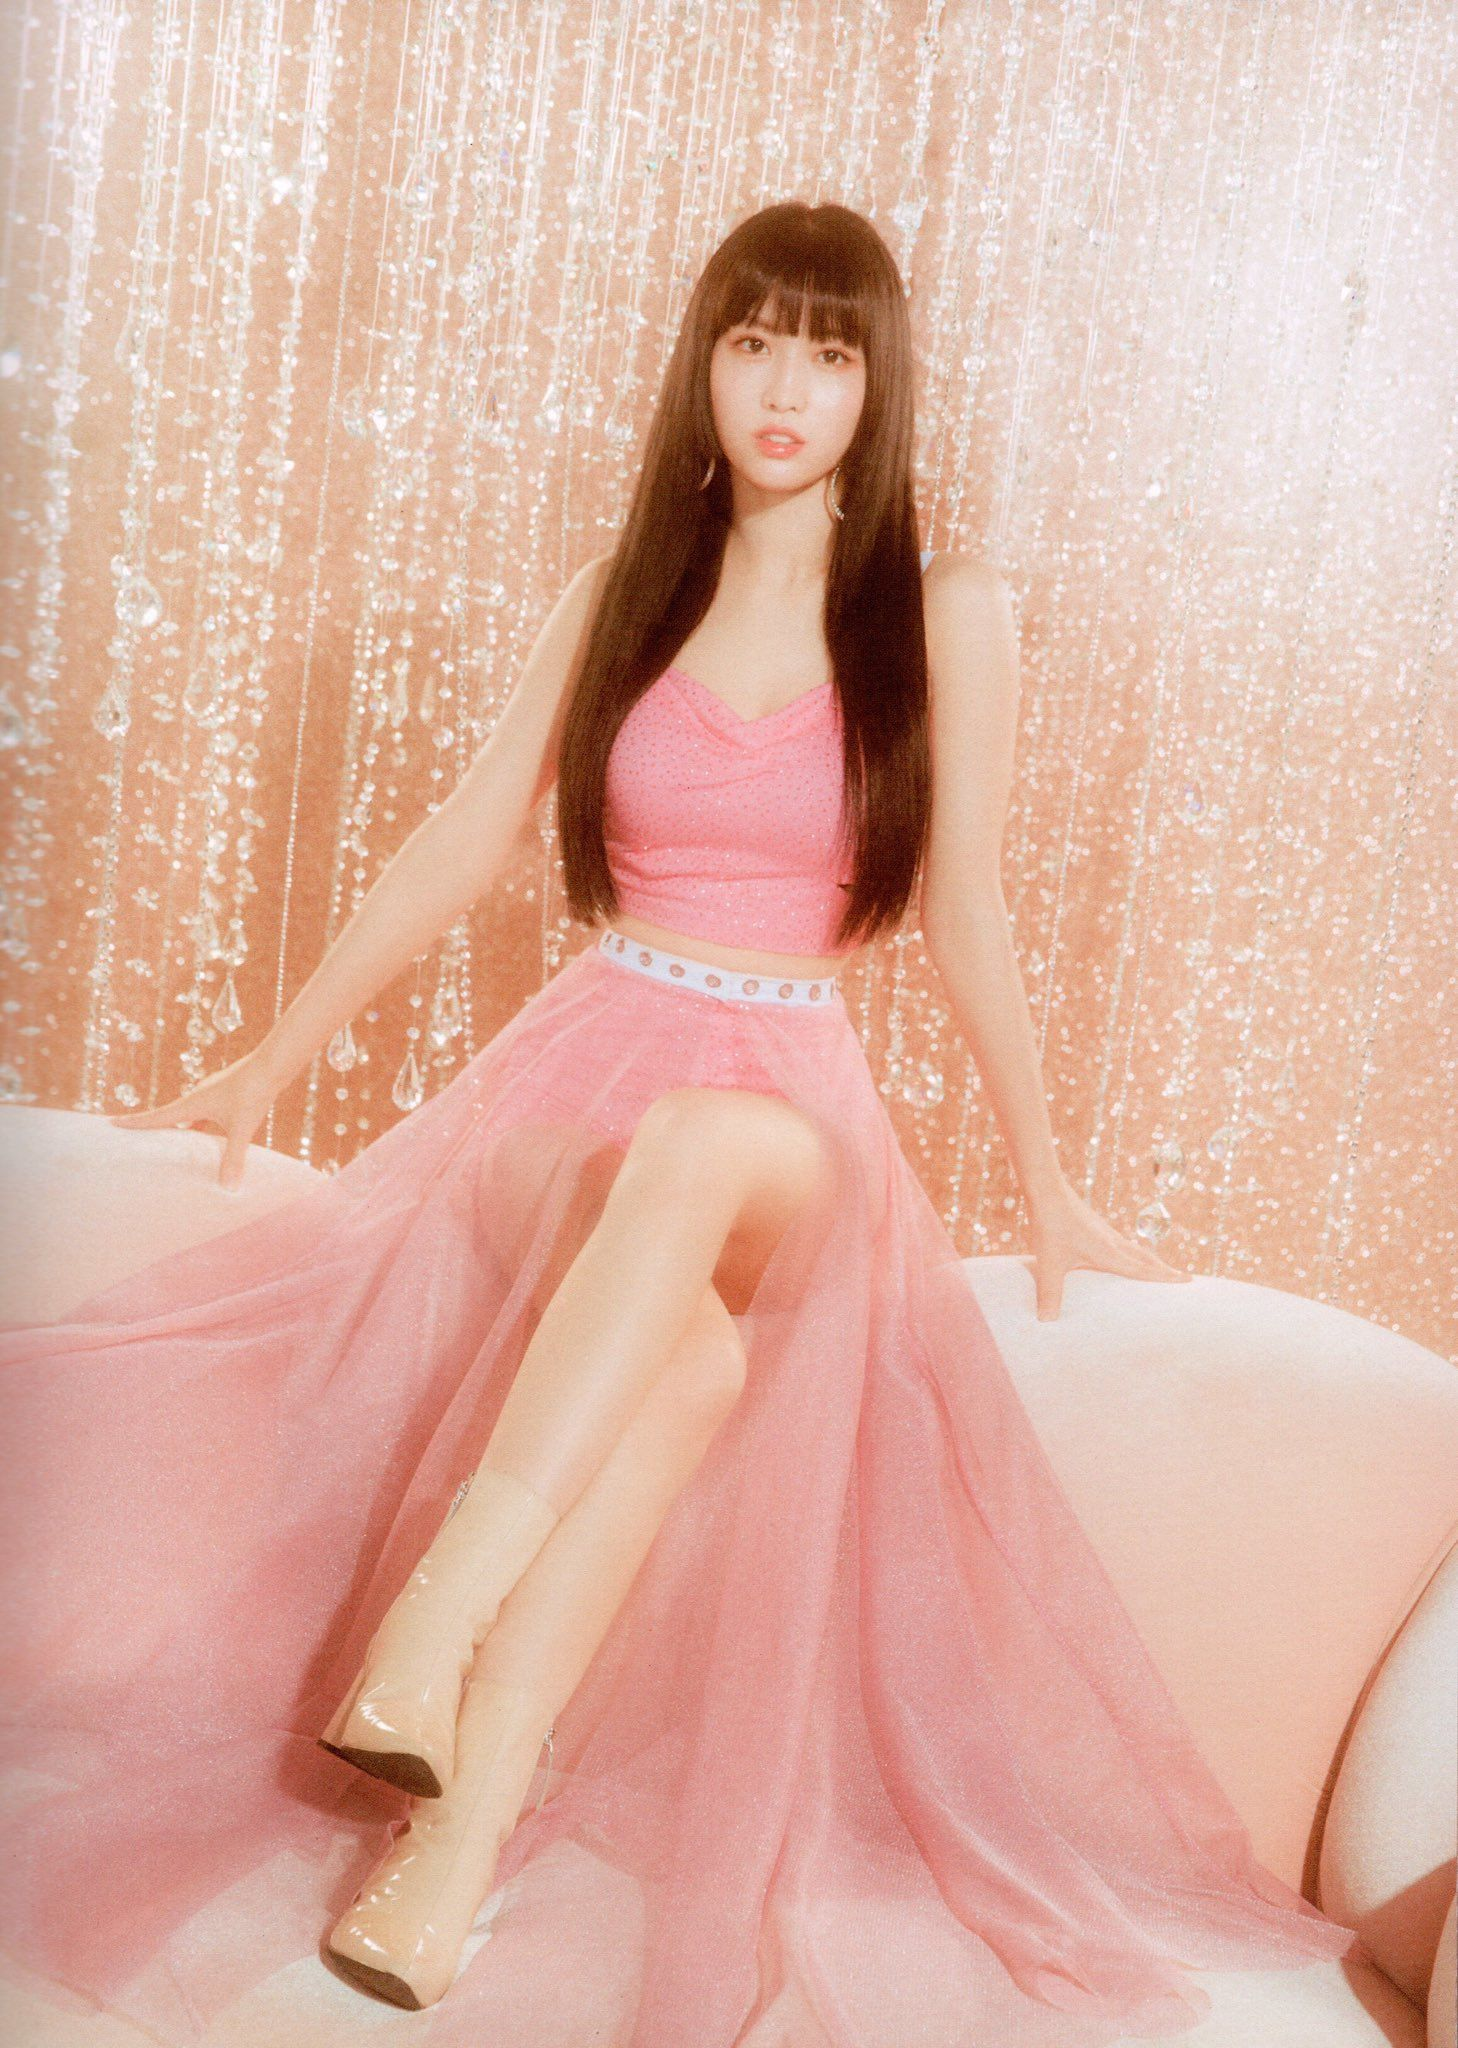 Pin de Kikas em 트와이스♥️ em 2020 Beleza asiática, Lisa